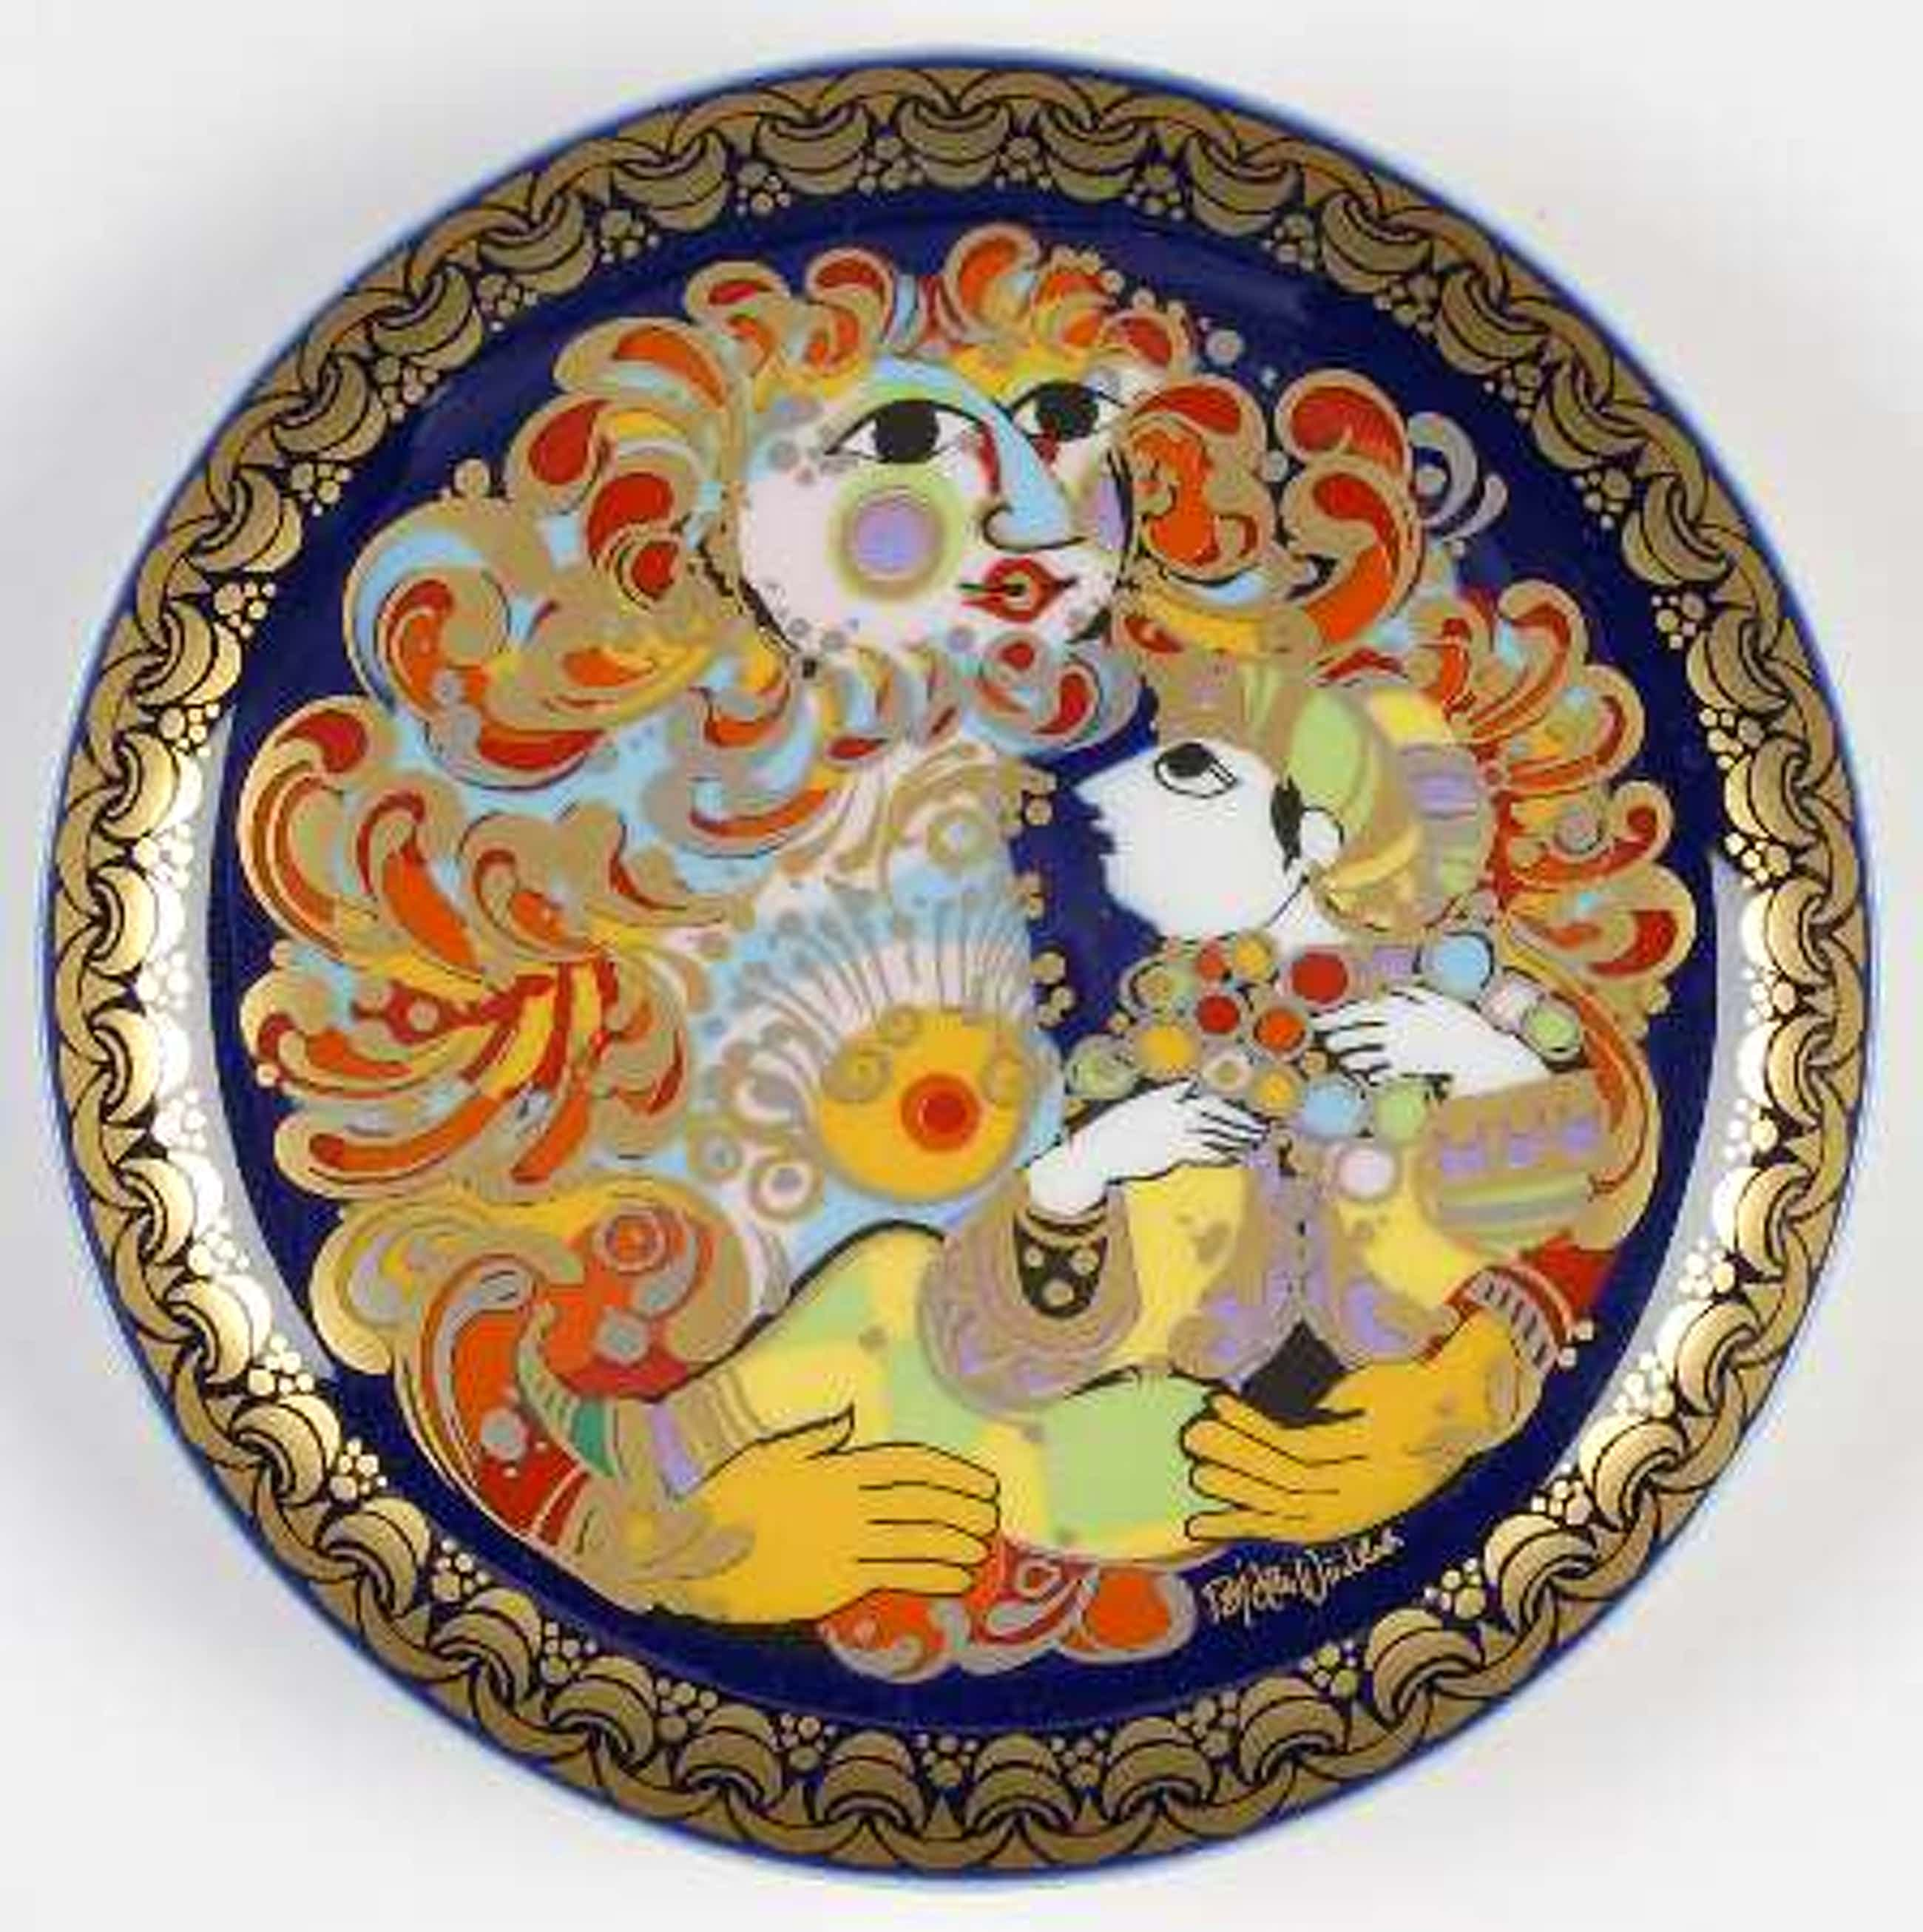 Bjorn Wiinblad - Aladin und die Wunderlampe (gedecoreerd porseleinen wandbord) kopen? Bied vanaf 11!